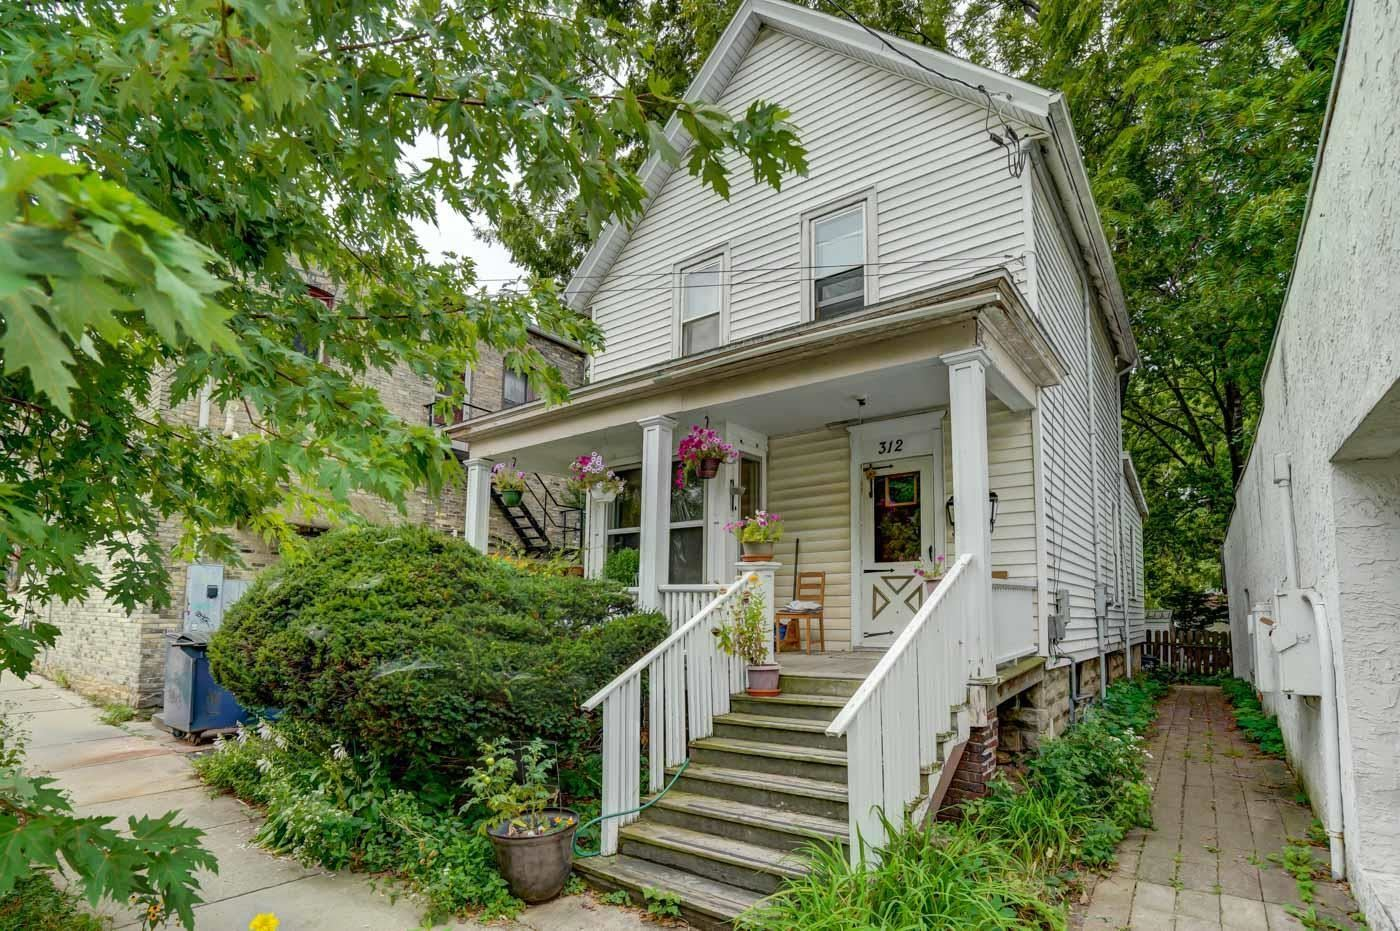 312 S Ingersoll St, Madison, WI 53703 - #: 1918961